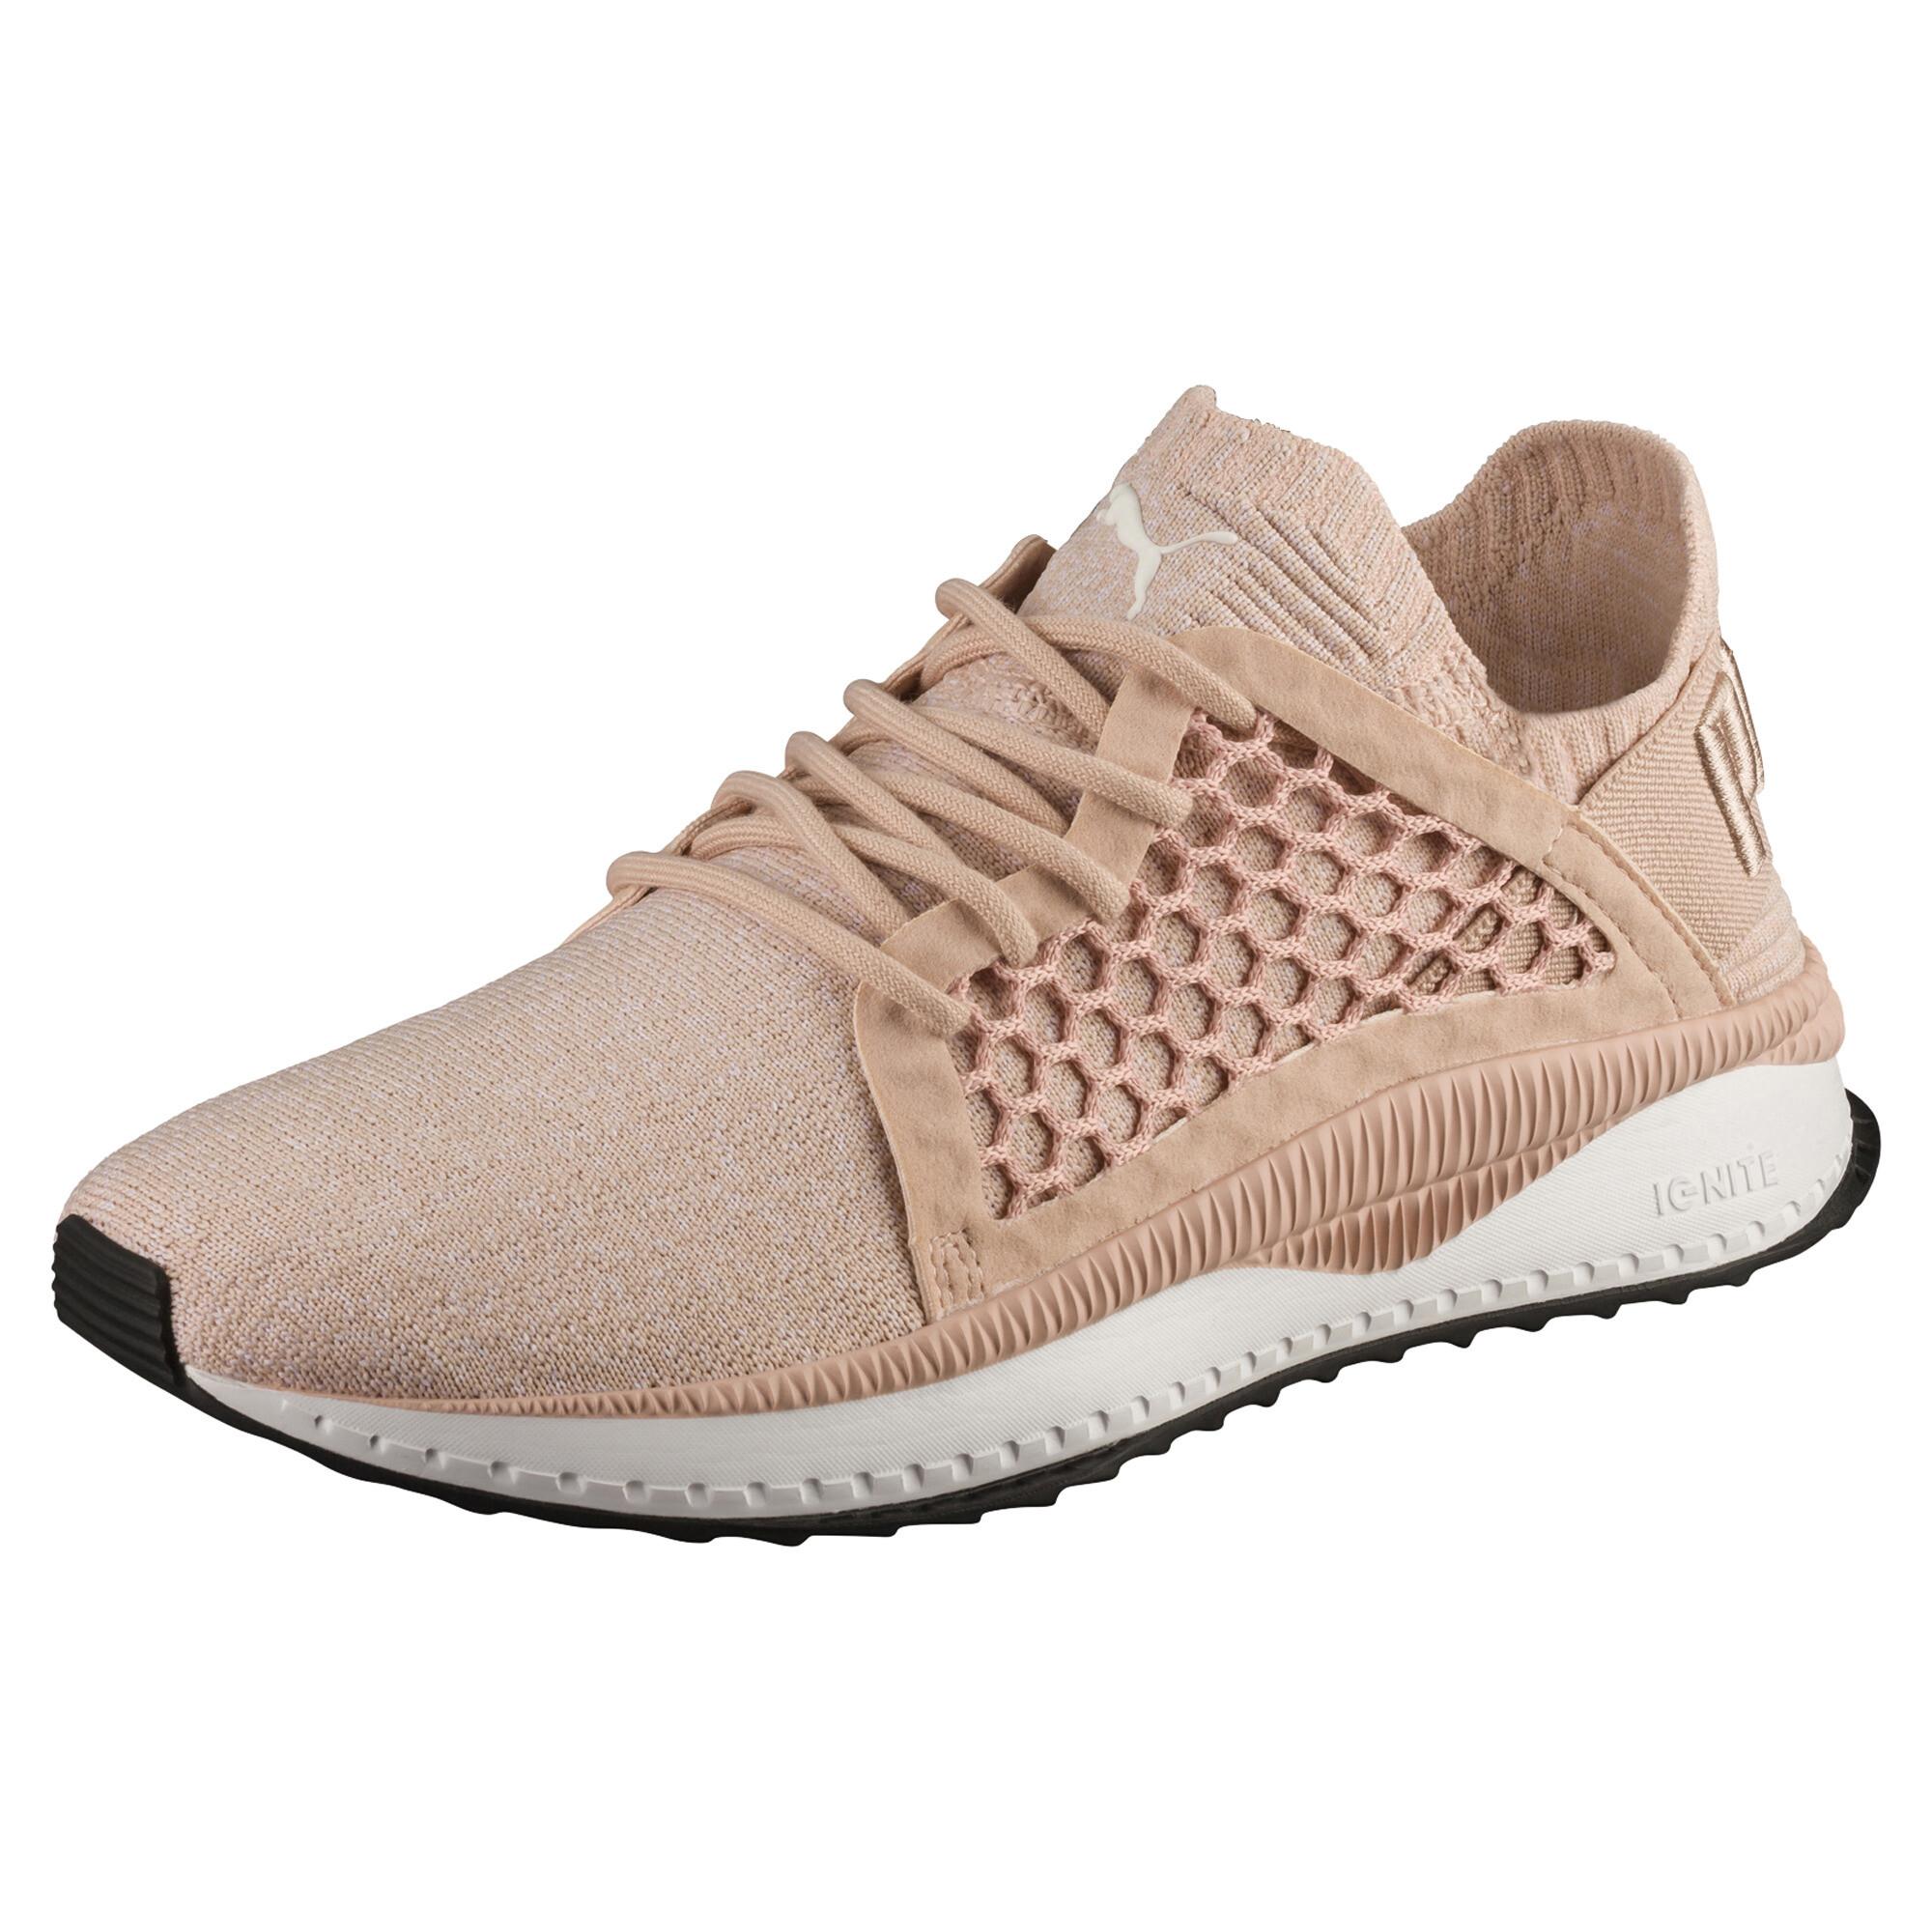 PUMA-TSUGI-NETFIT-evoKNIT-Sneaker-Frauen-Schuhe-Neu Indexbild 16